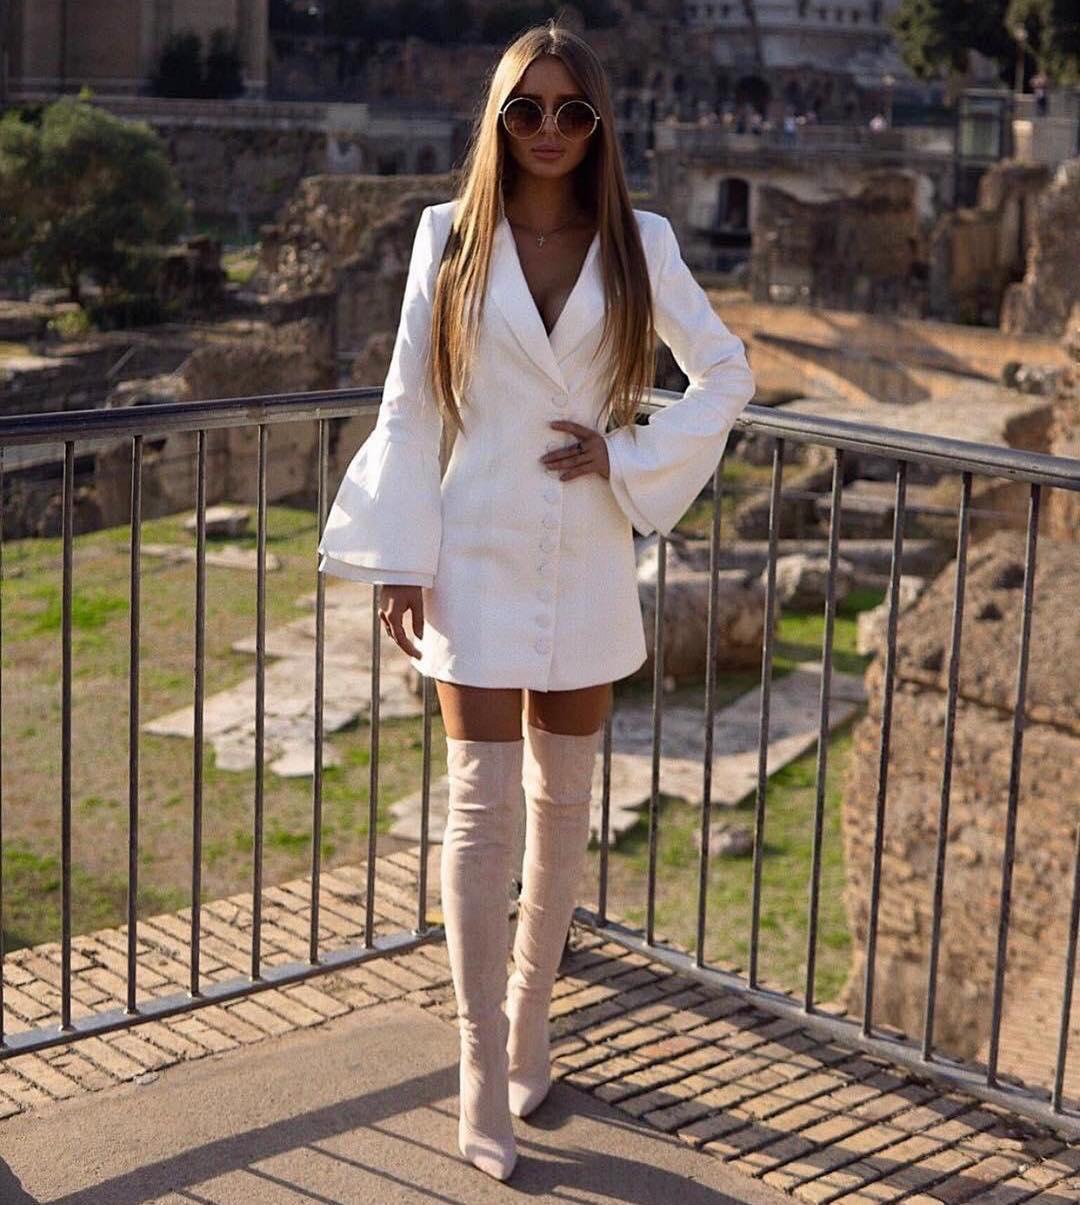 Bell Sleeve White Blazer Dress And Beige OTK Boots 2020